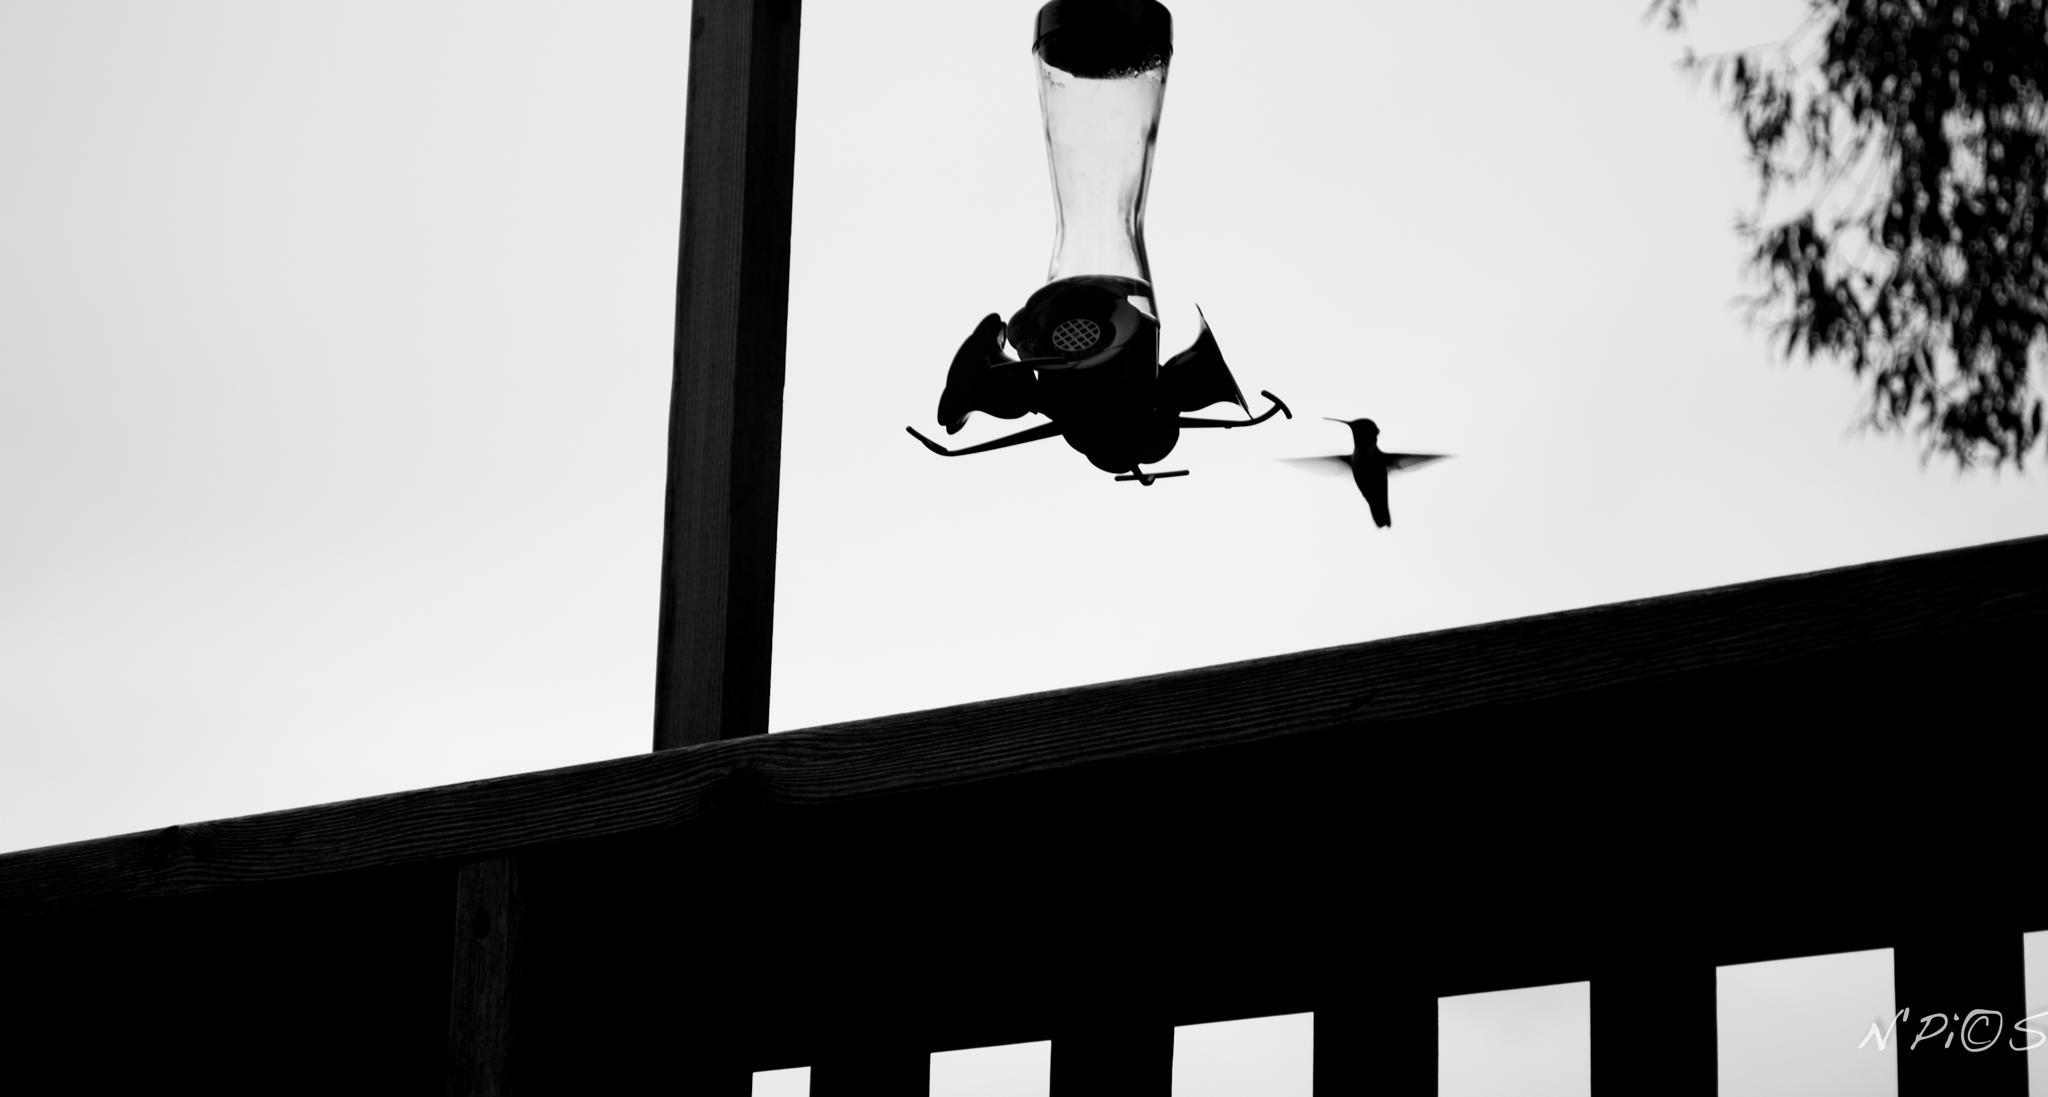 Petit Colibri by N'Pics